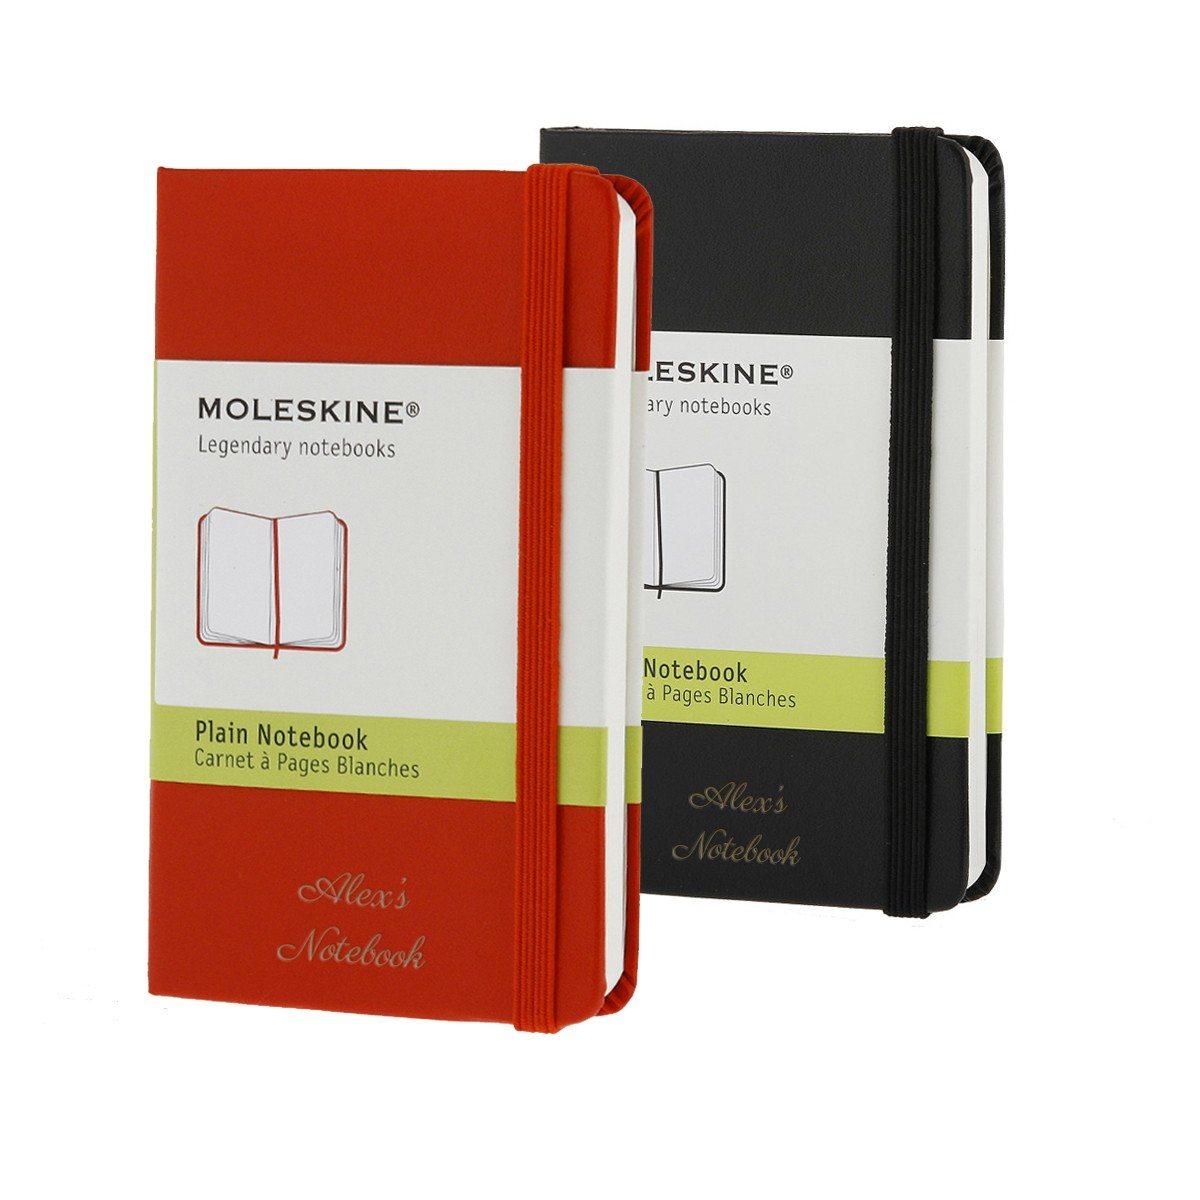 Moleskine-Notizbuch mit Gravur